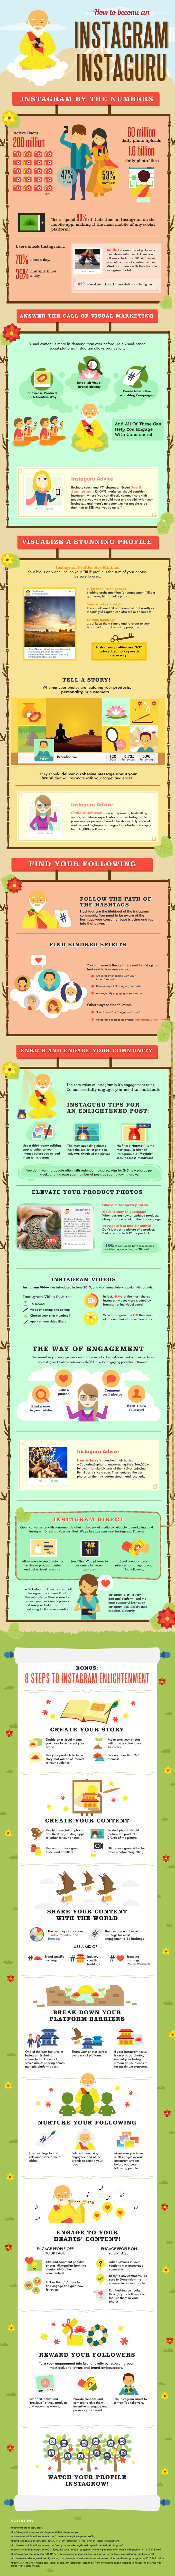 Instagram Instaguru Infographic